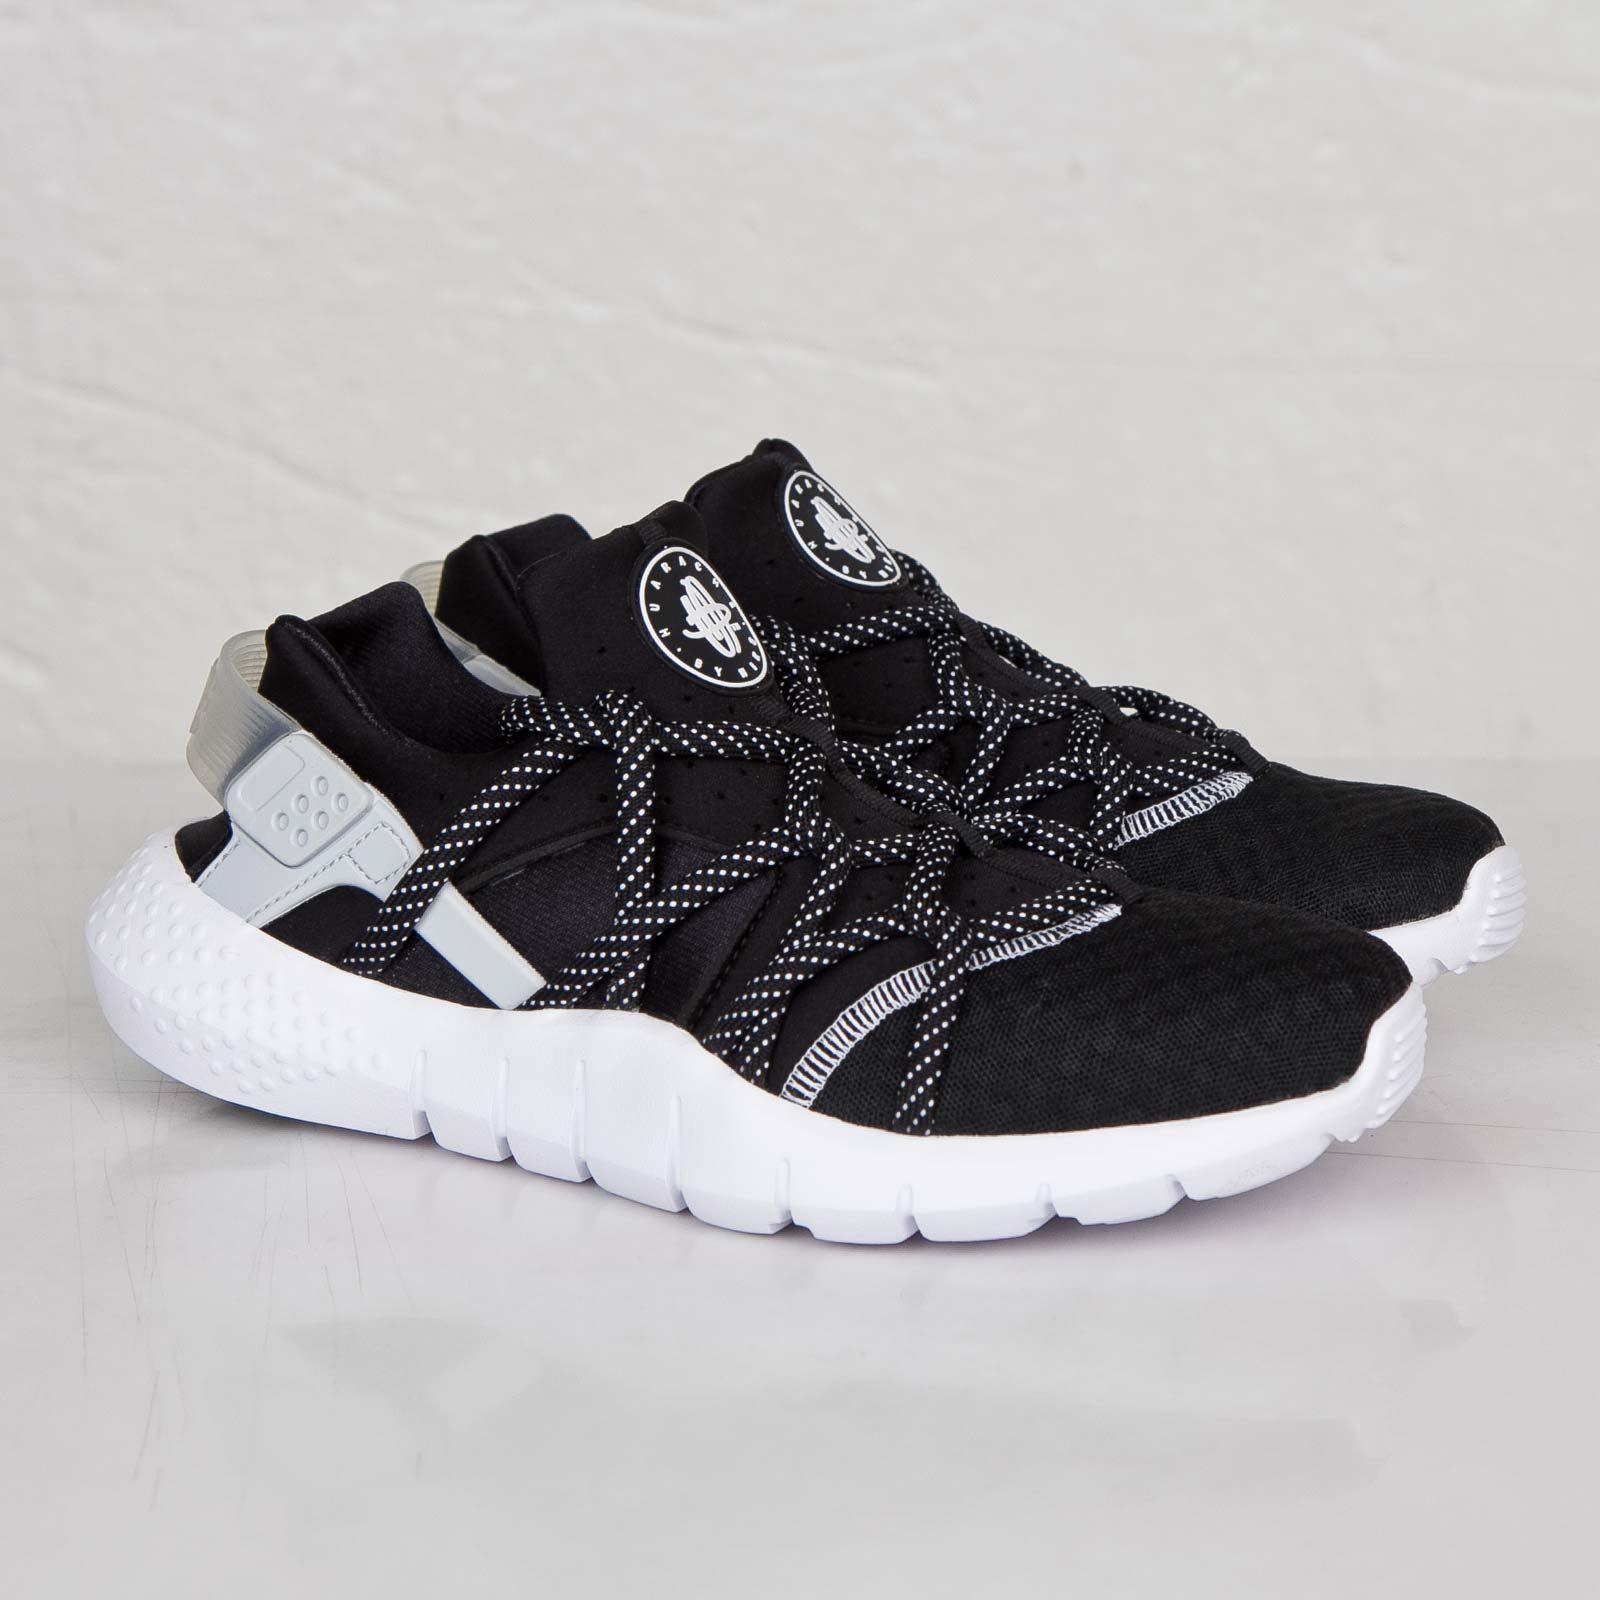 a3d10c1cb1bf6 Nike Huarache NM - 705159-001 - Sneakersnstuff